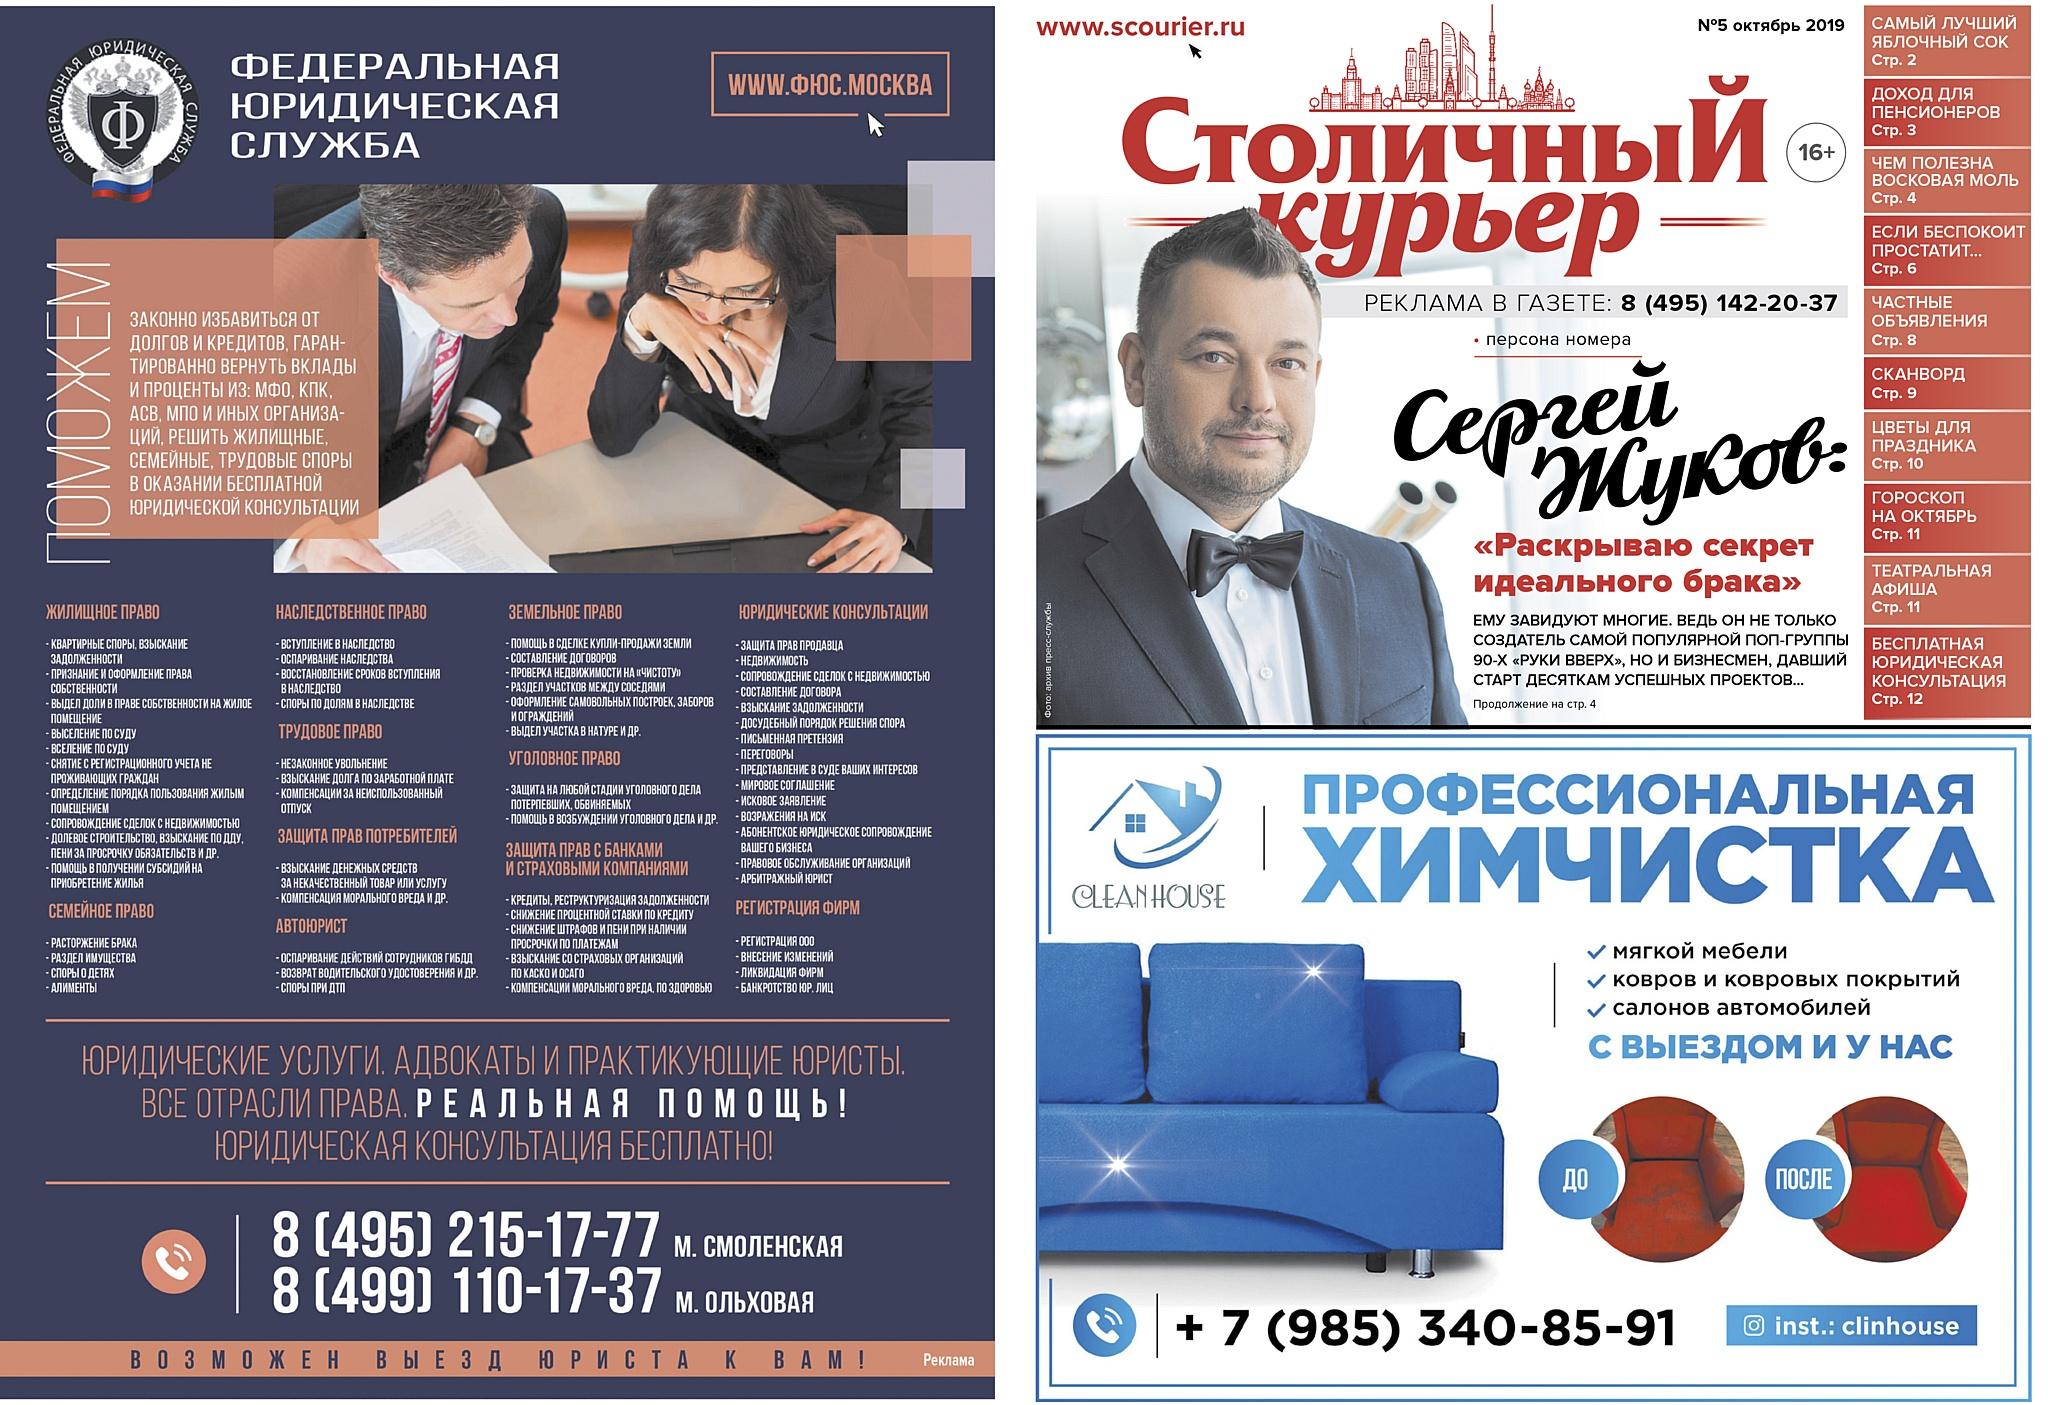 Газета «Столичный курьер» №5, октябрь 2019.